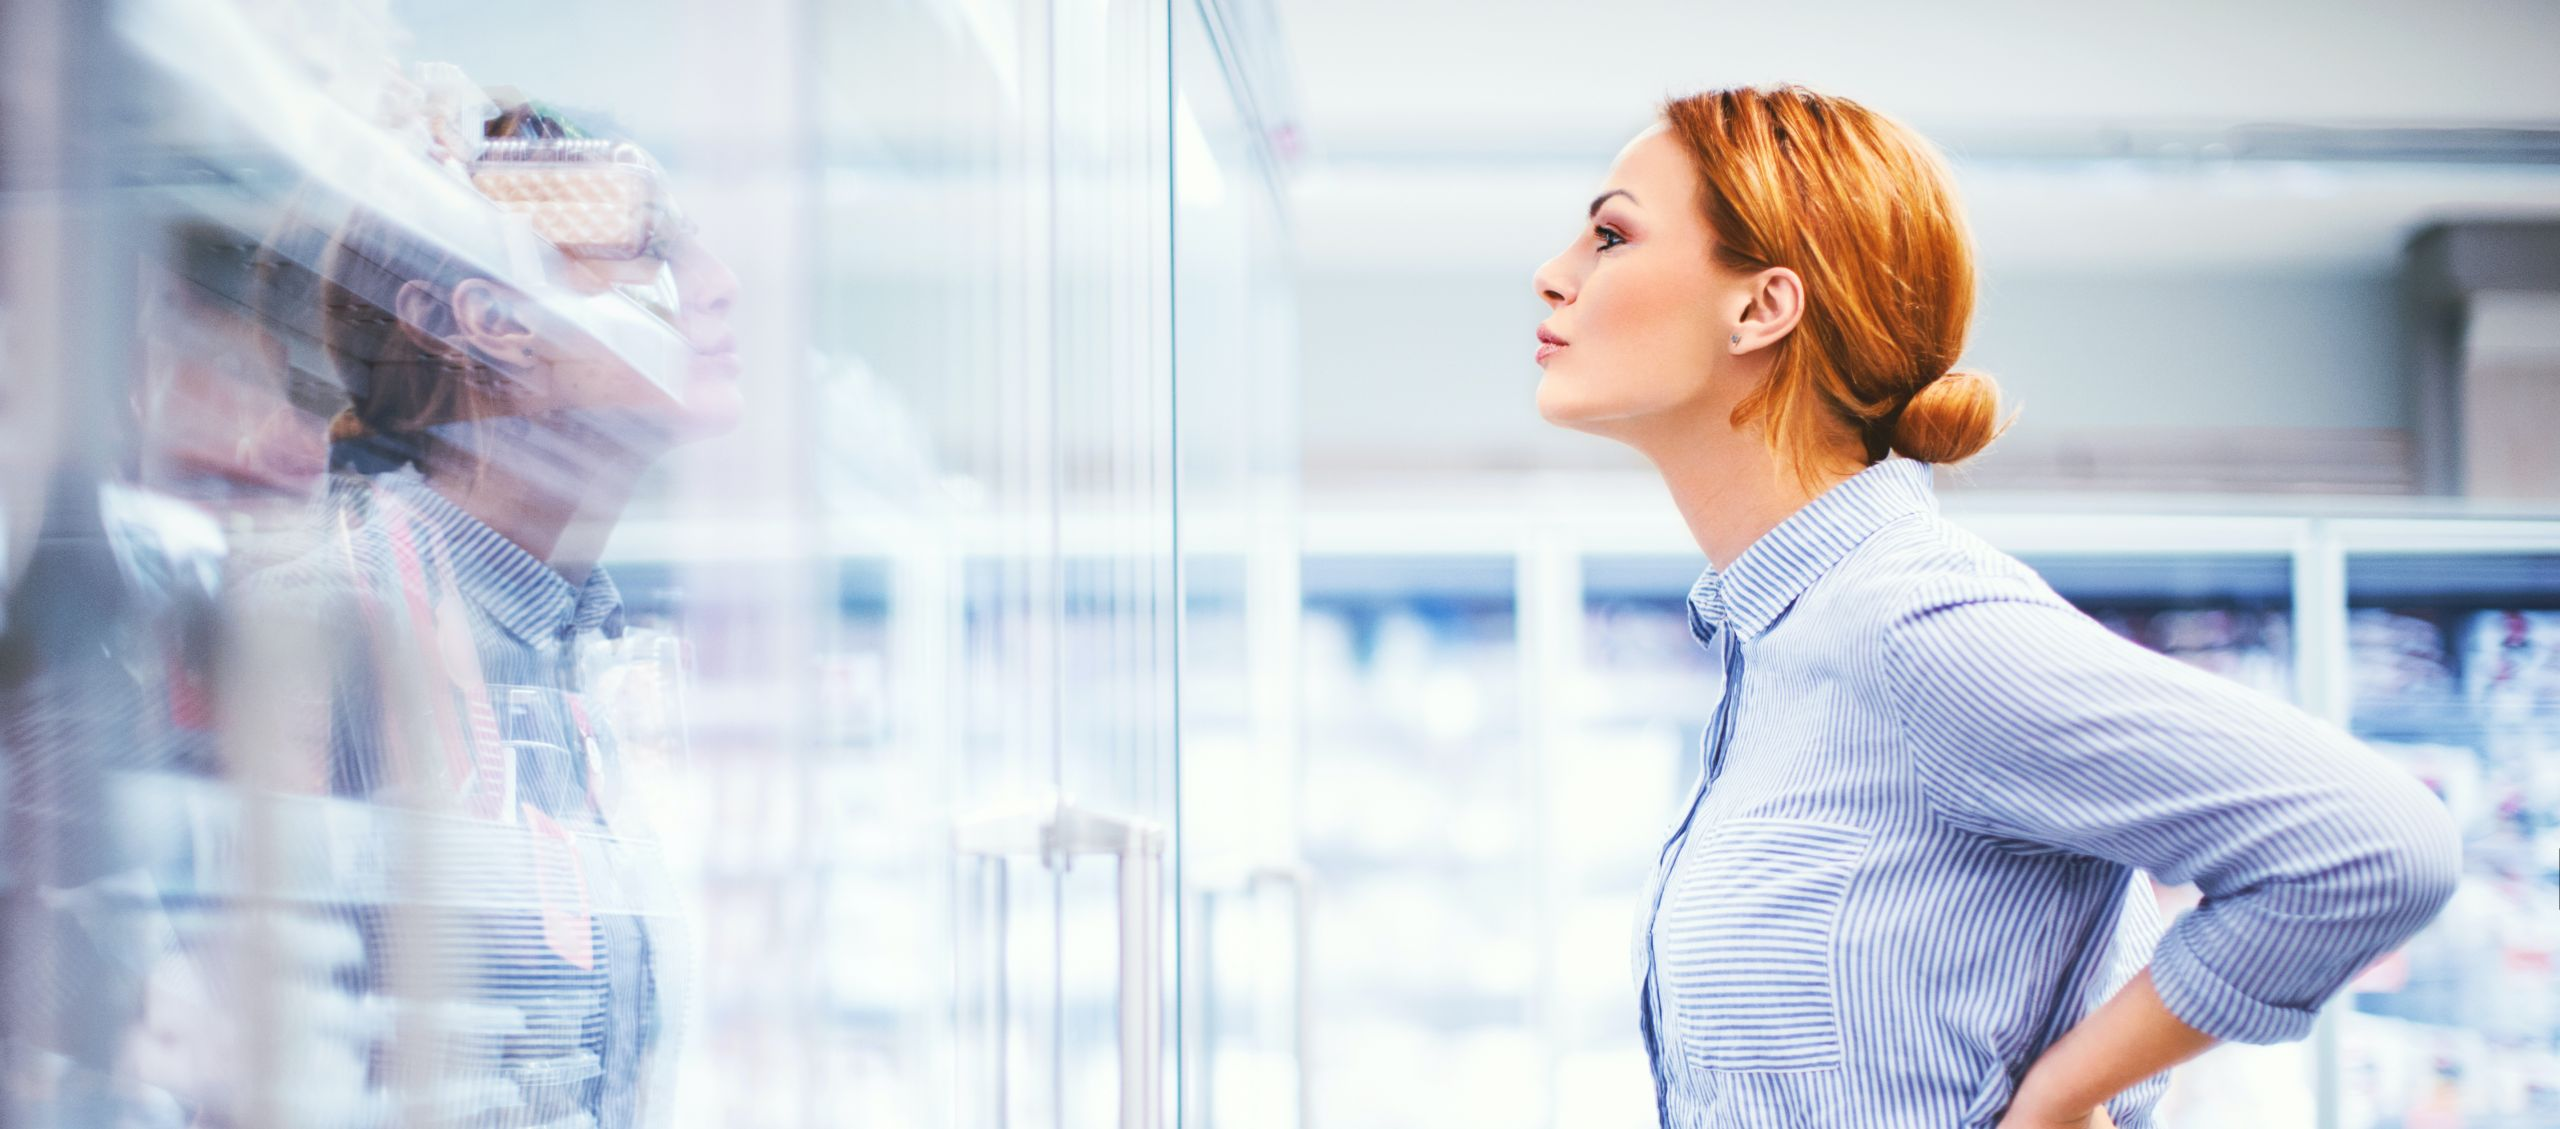 Five Future Retail Trends